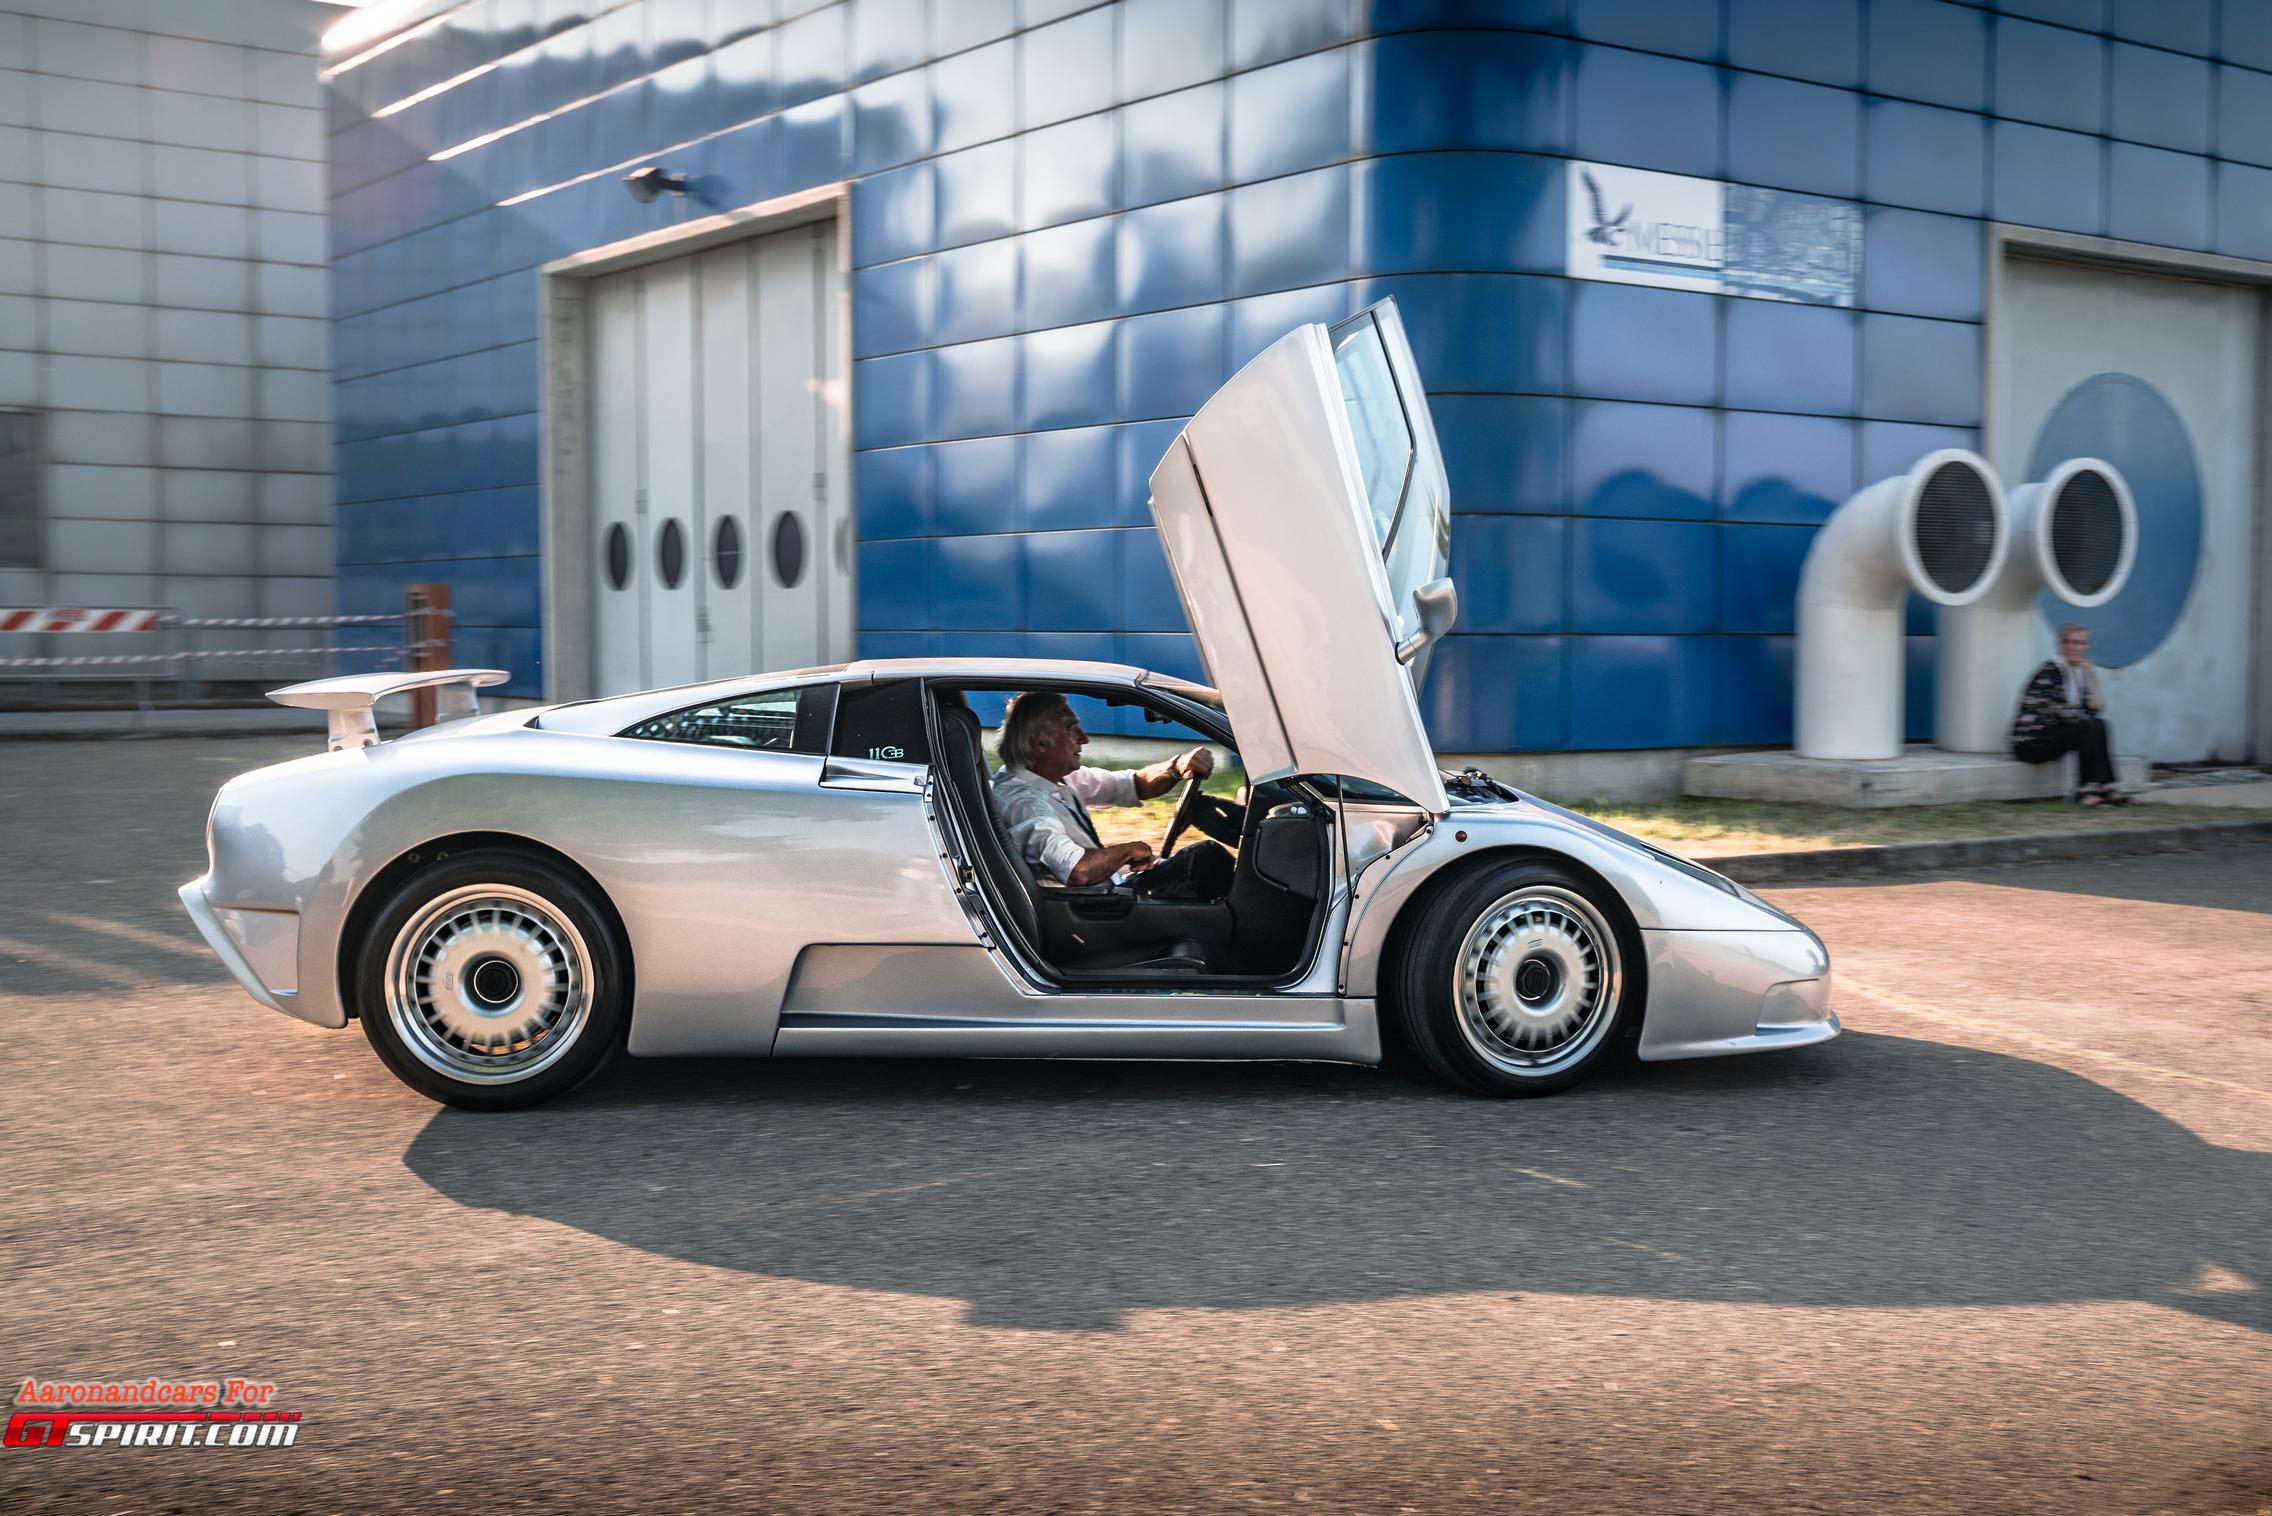 Bugatti EB110 Side View